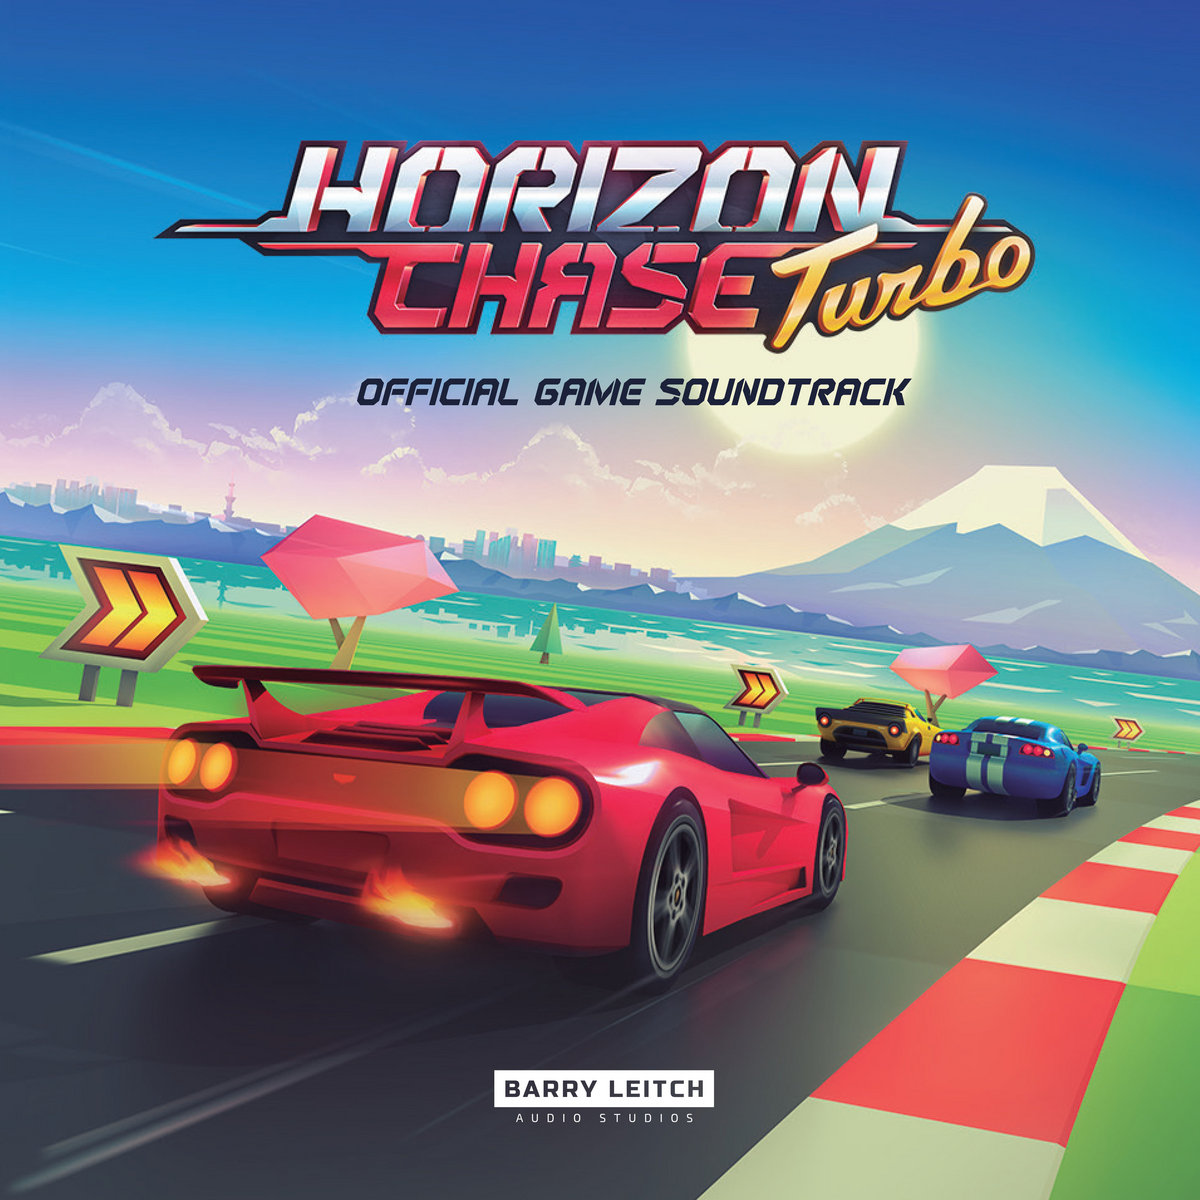 Roblox Deathrun Soundtrack Roblox Soundtrack Download